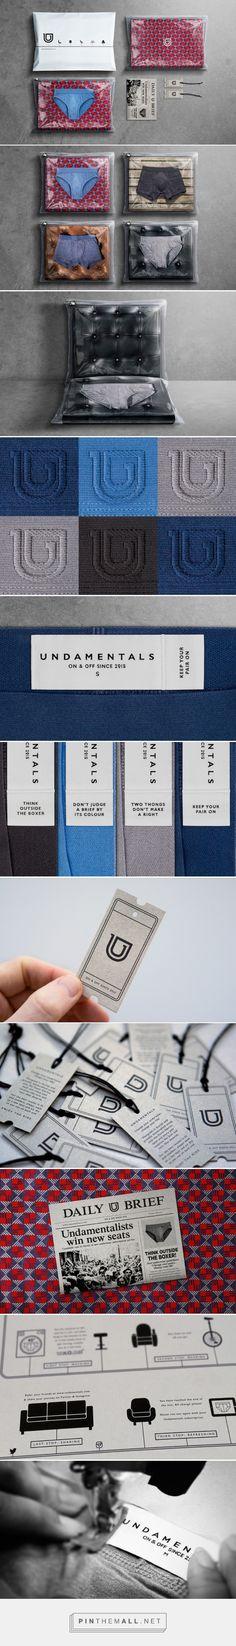 Undamentals underwear packaging designed by Afterhours (Switzerland) - http://www.packagingoftheworld.com/2016/03/undamentals.html